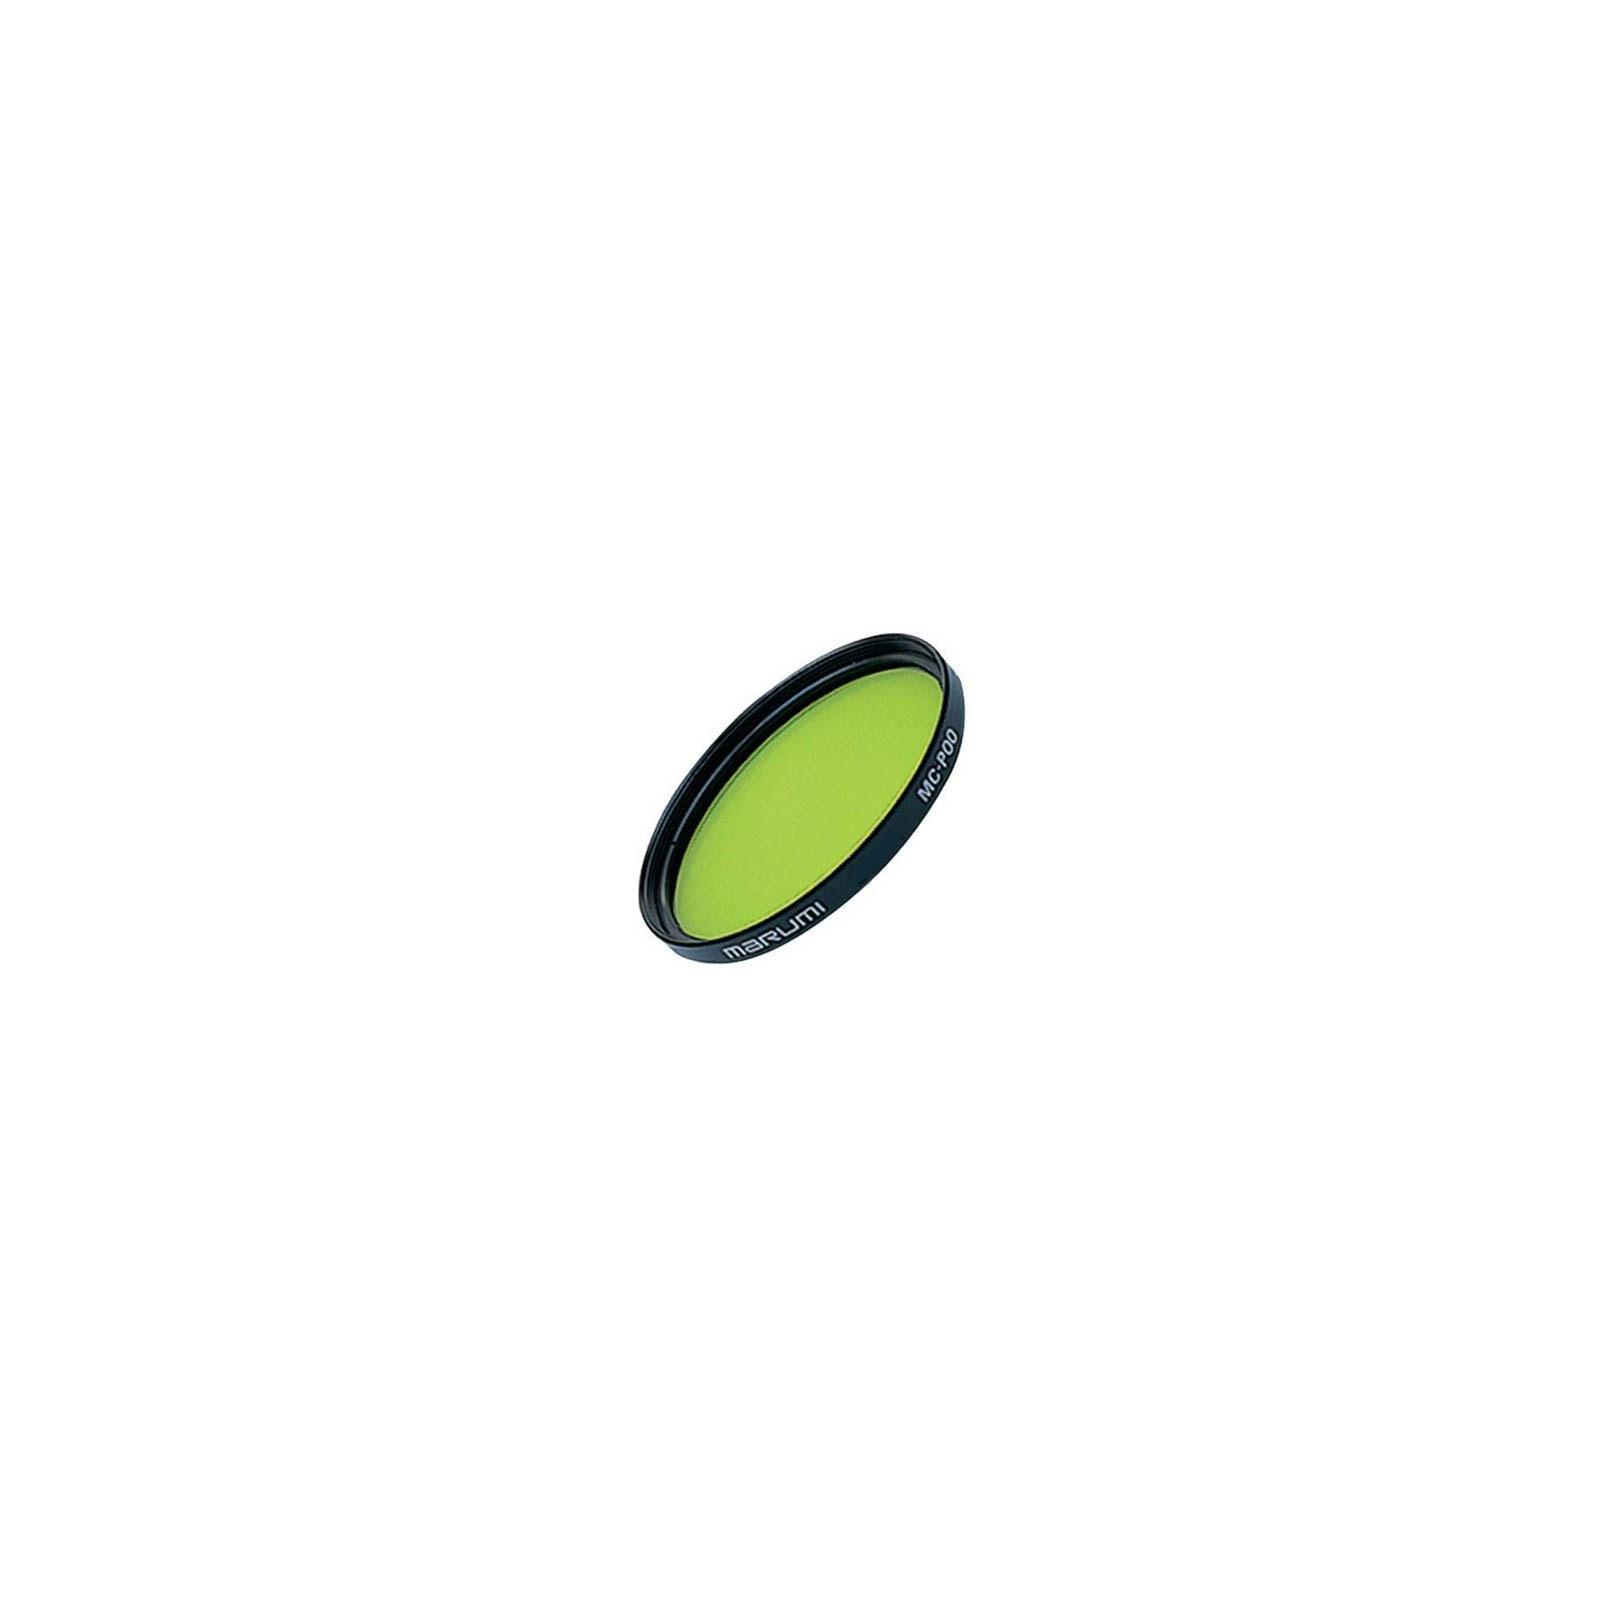 Светофильтр Marumi Р00 (yellow-green) 72mm (00 (yellow-green) 72mm)